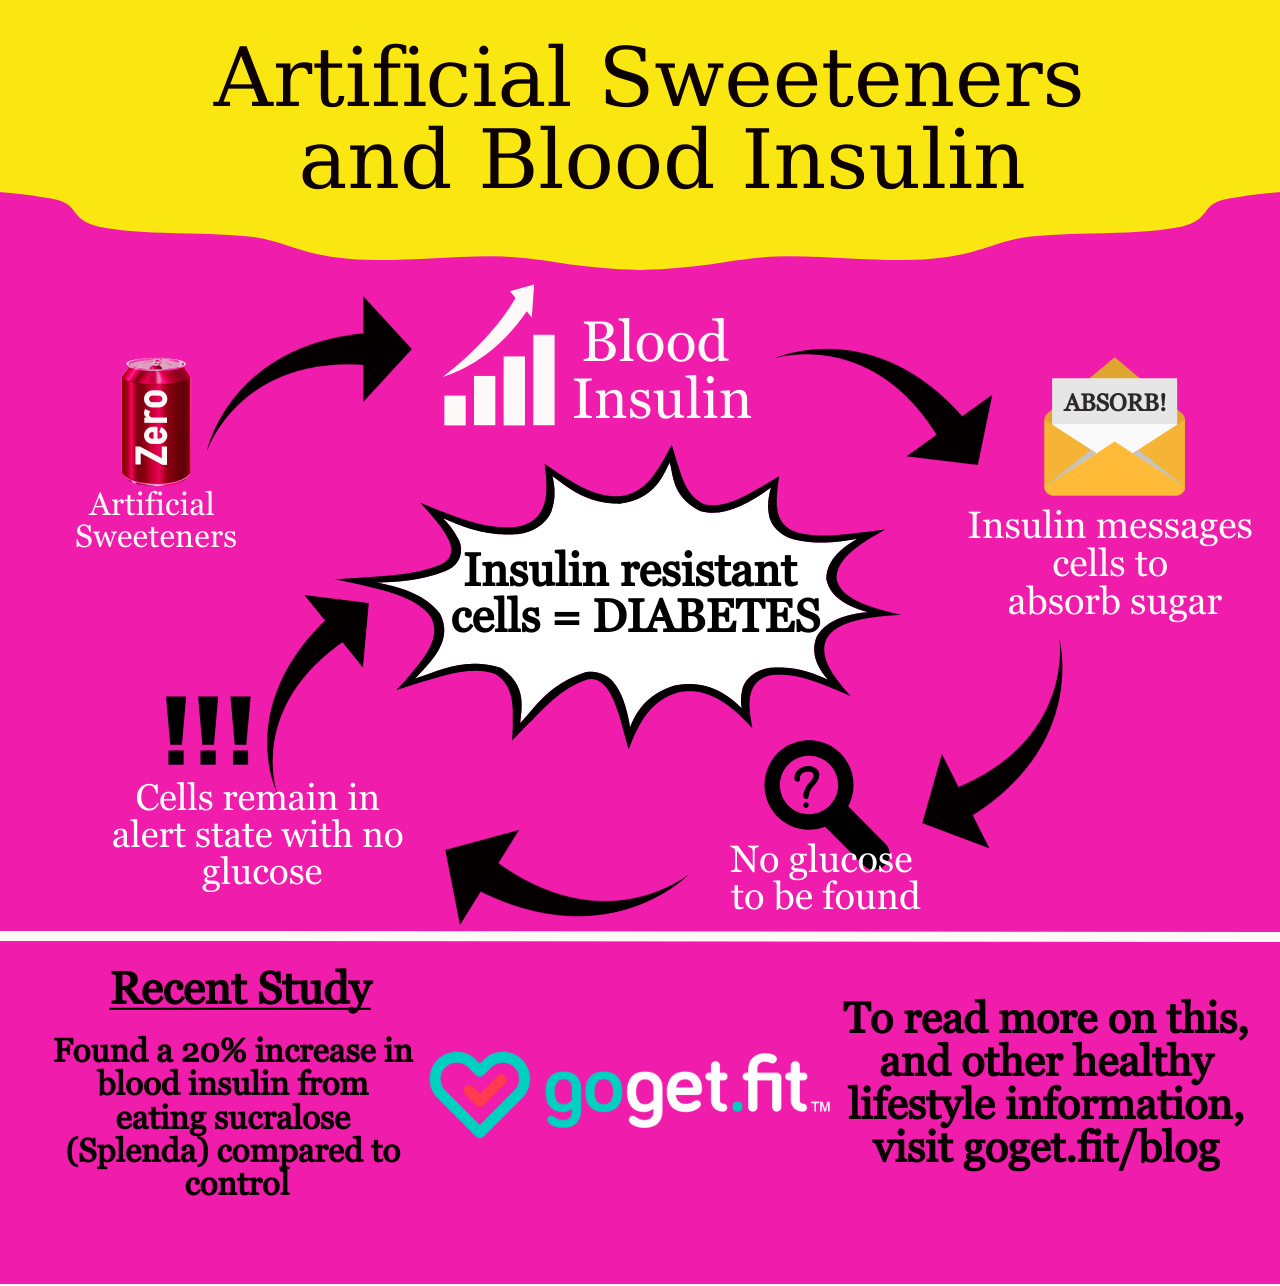 Blood Insulin Artificial Sweetener.png